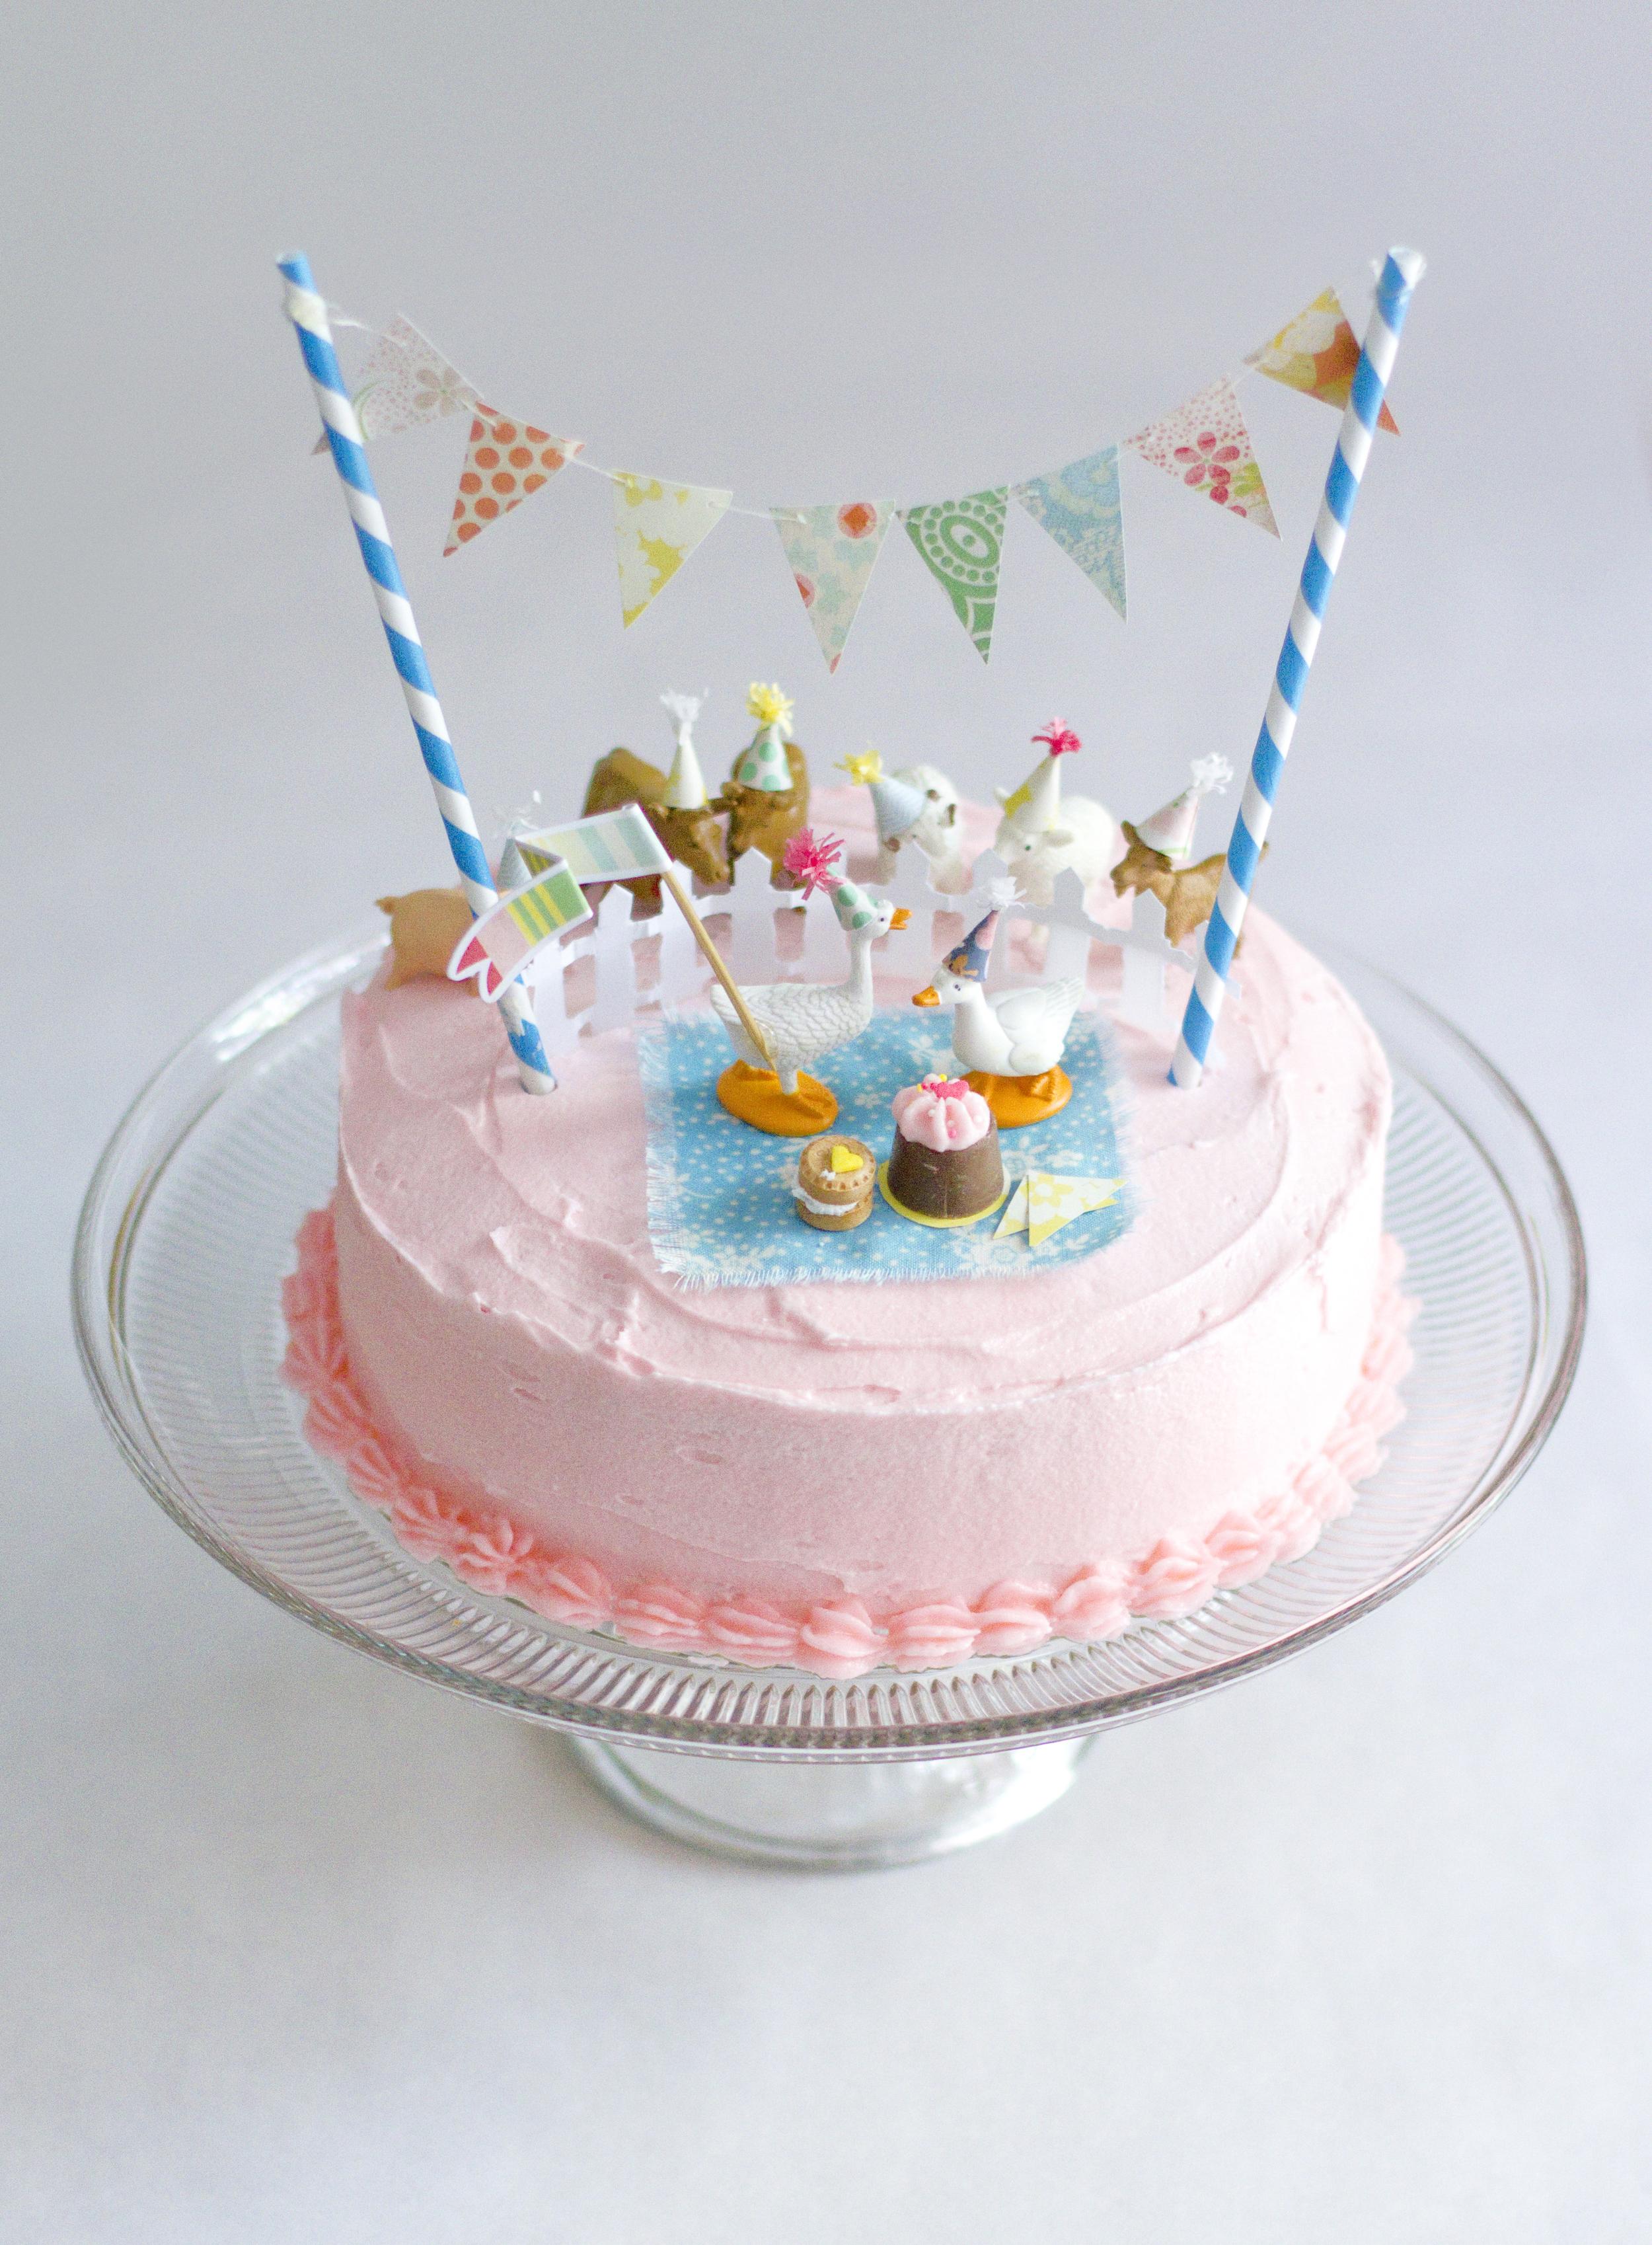 Cake_110213_5_background.jpg